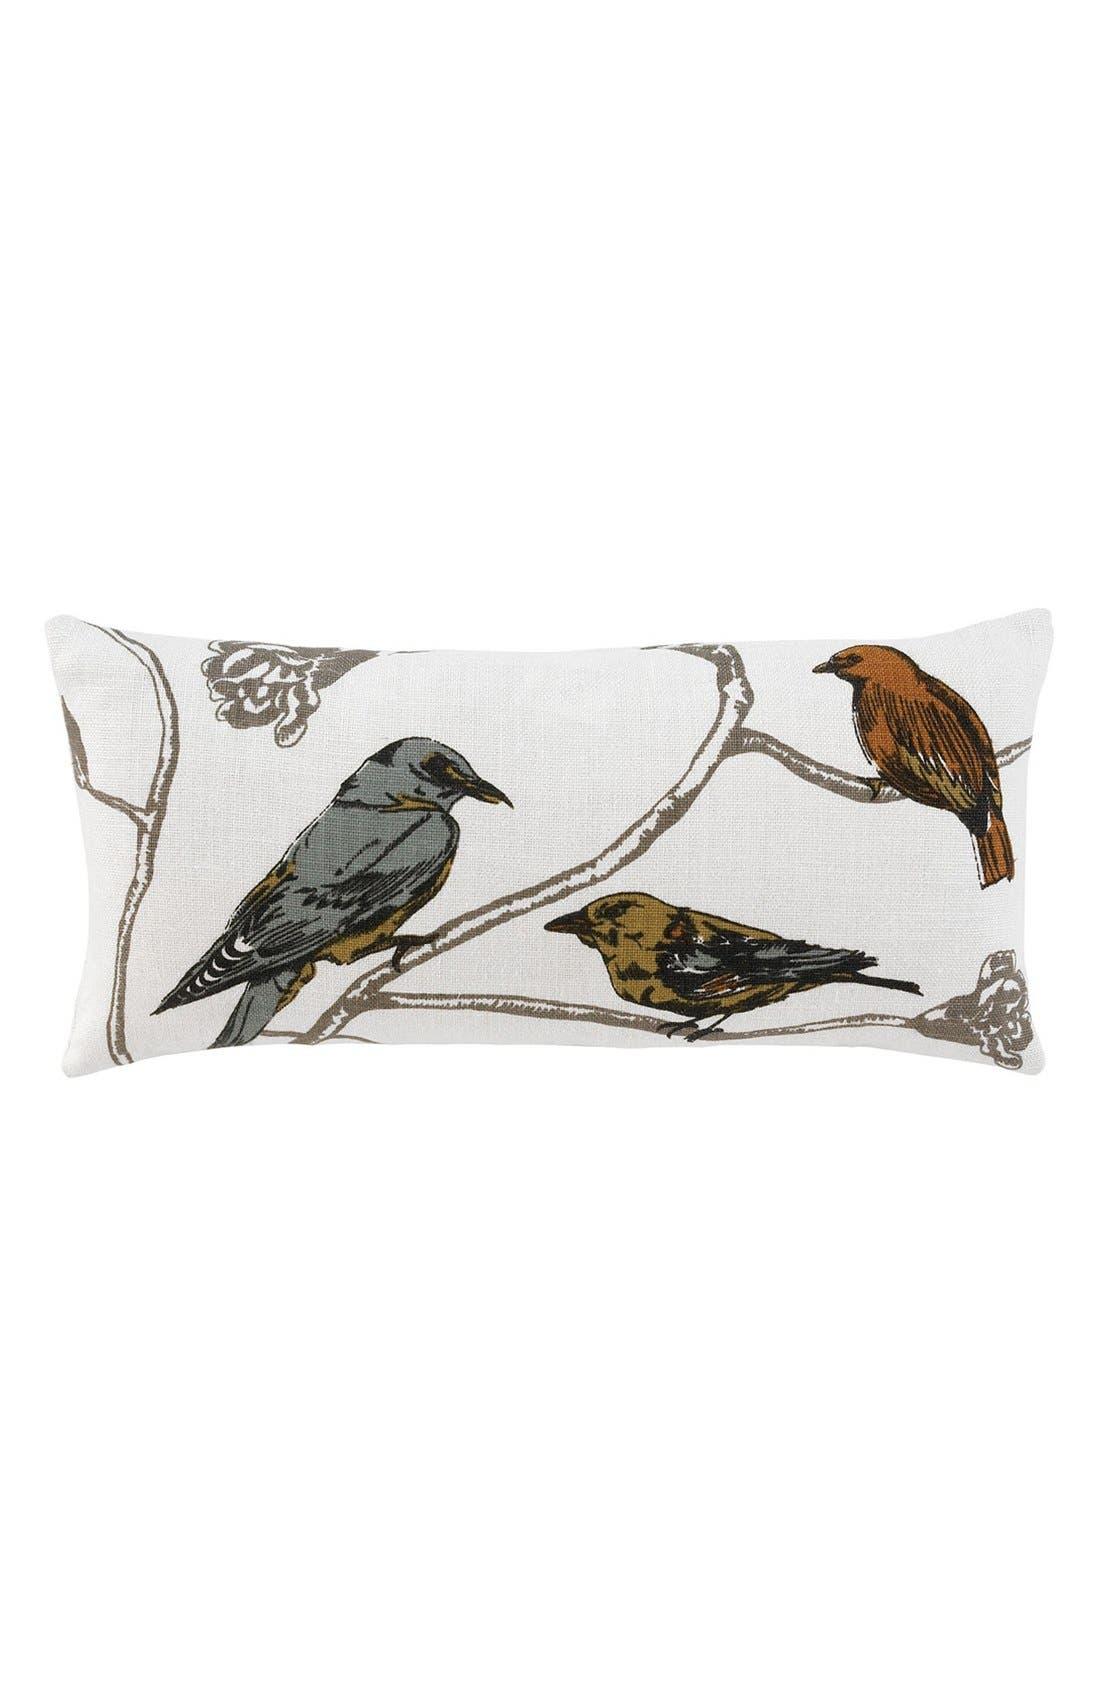 'Chinoiserie' Decorative Pillow,                         Main,                         color, White/ Multi